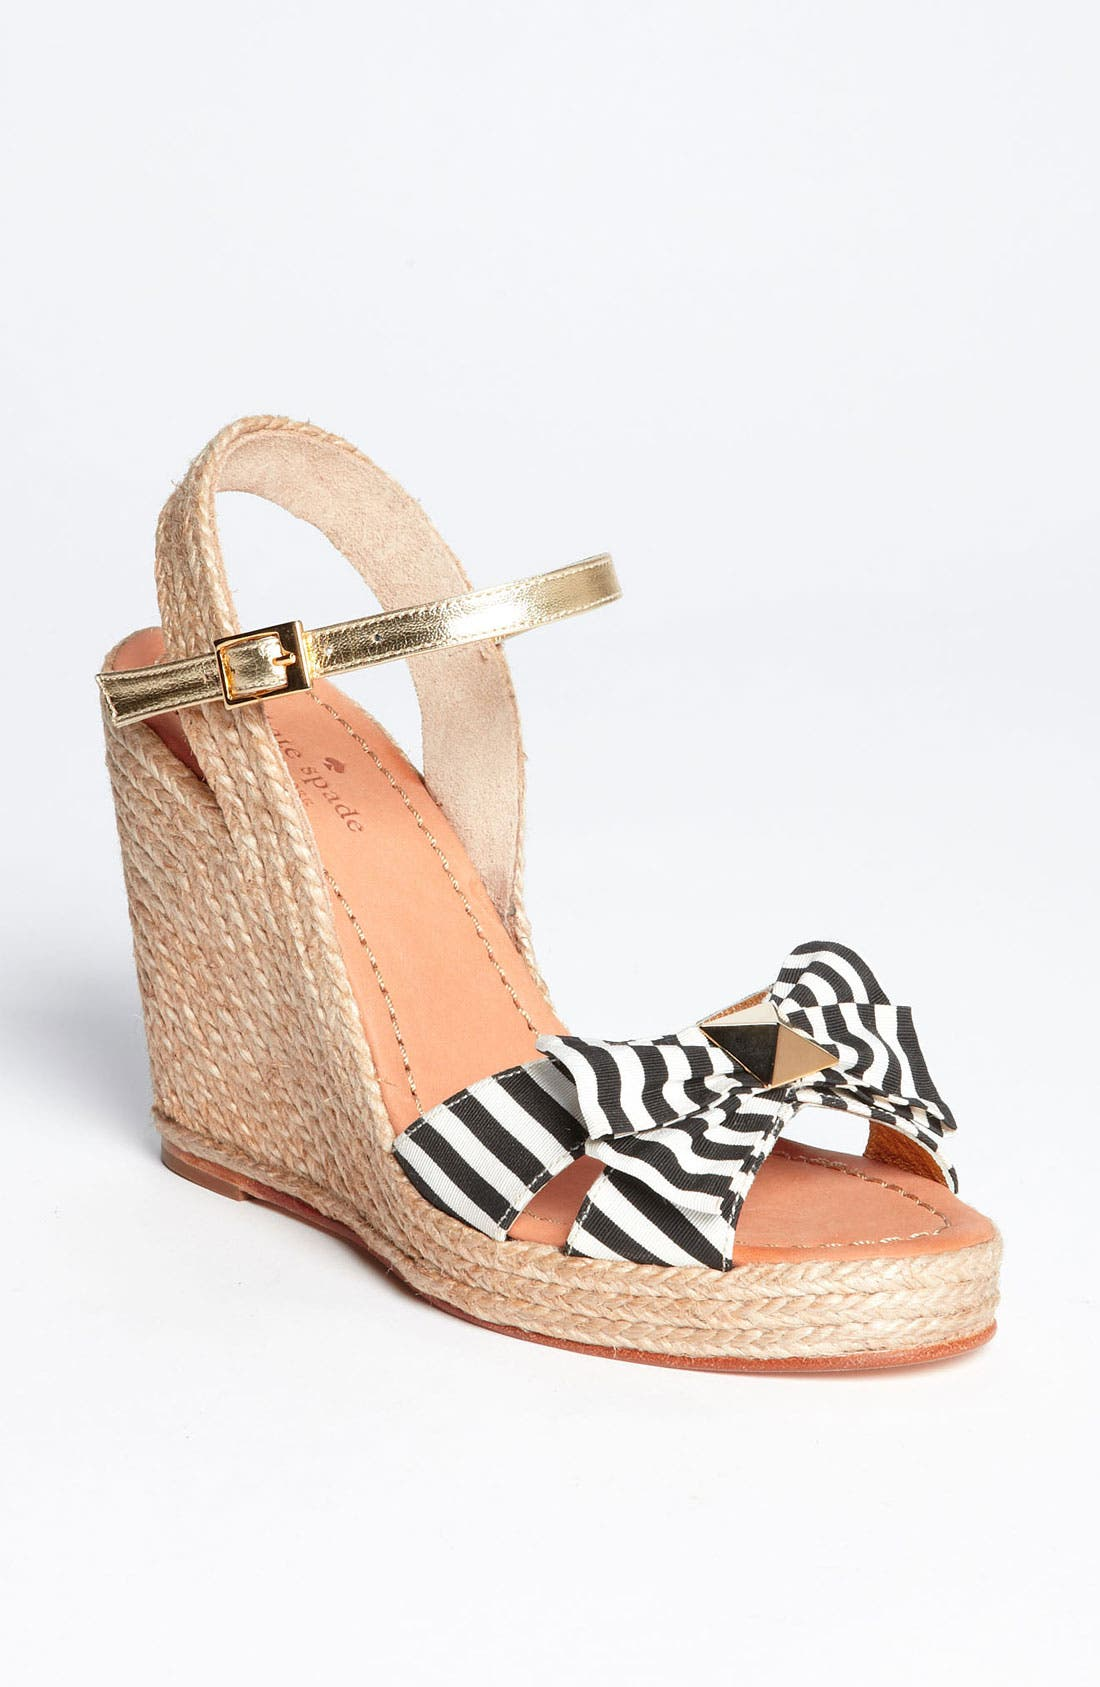 Main Image - kate spade new york 'carmelita' wedge sandal